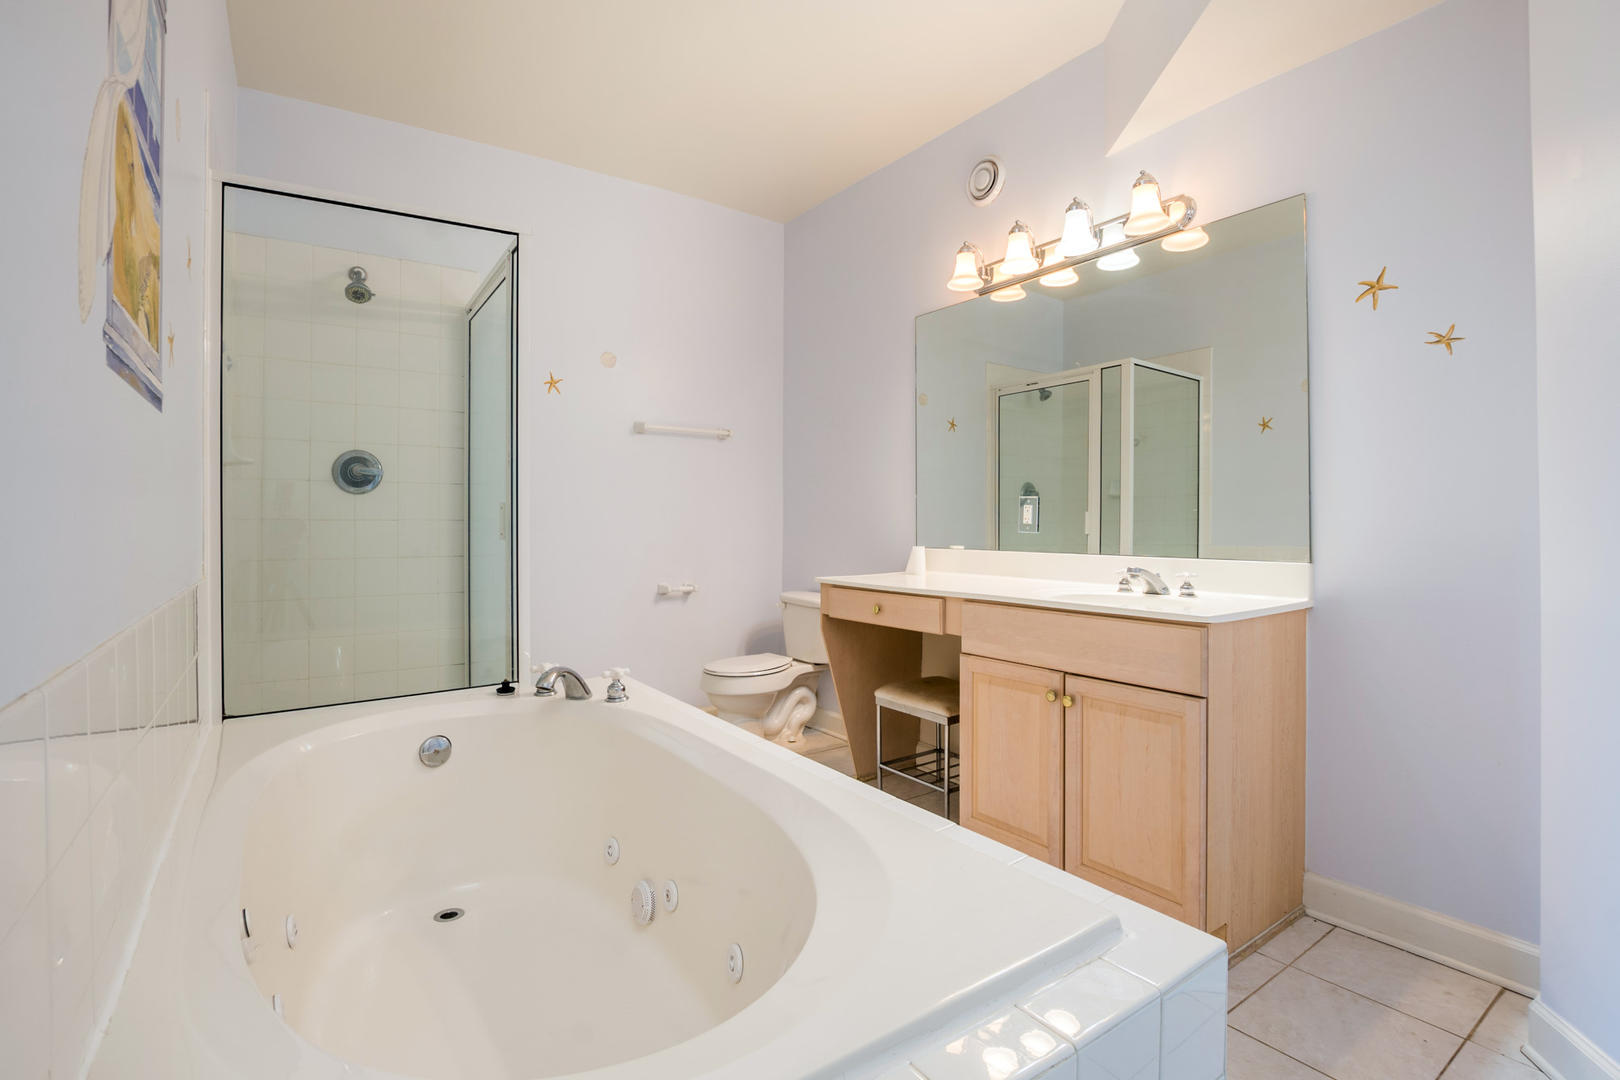 Maresol 309 - Master Bathroom